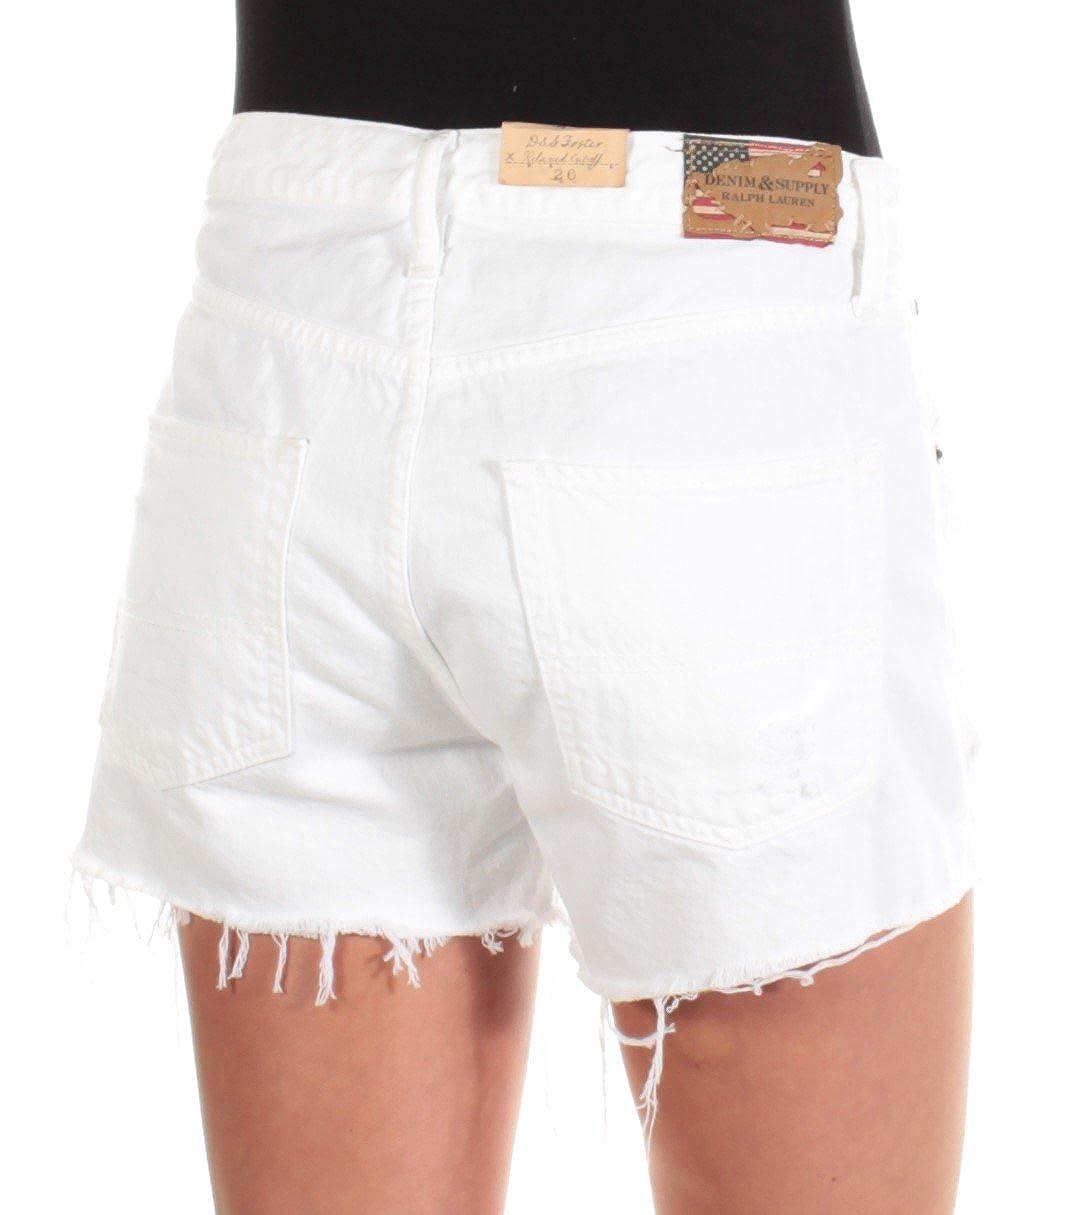 0b6fb68d2 RALPH LAUREN Denim & Supply Boyfriend Cut-Off Shorts (24, Vail) at Amazon  Women's Clothing store: